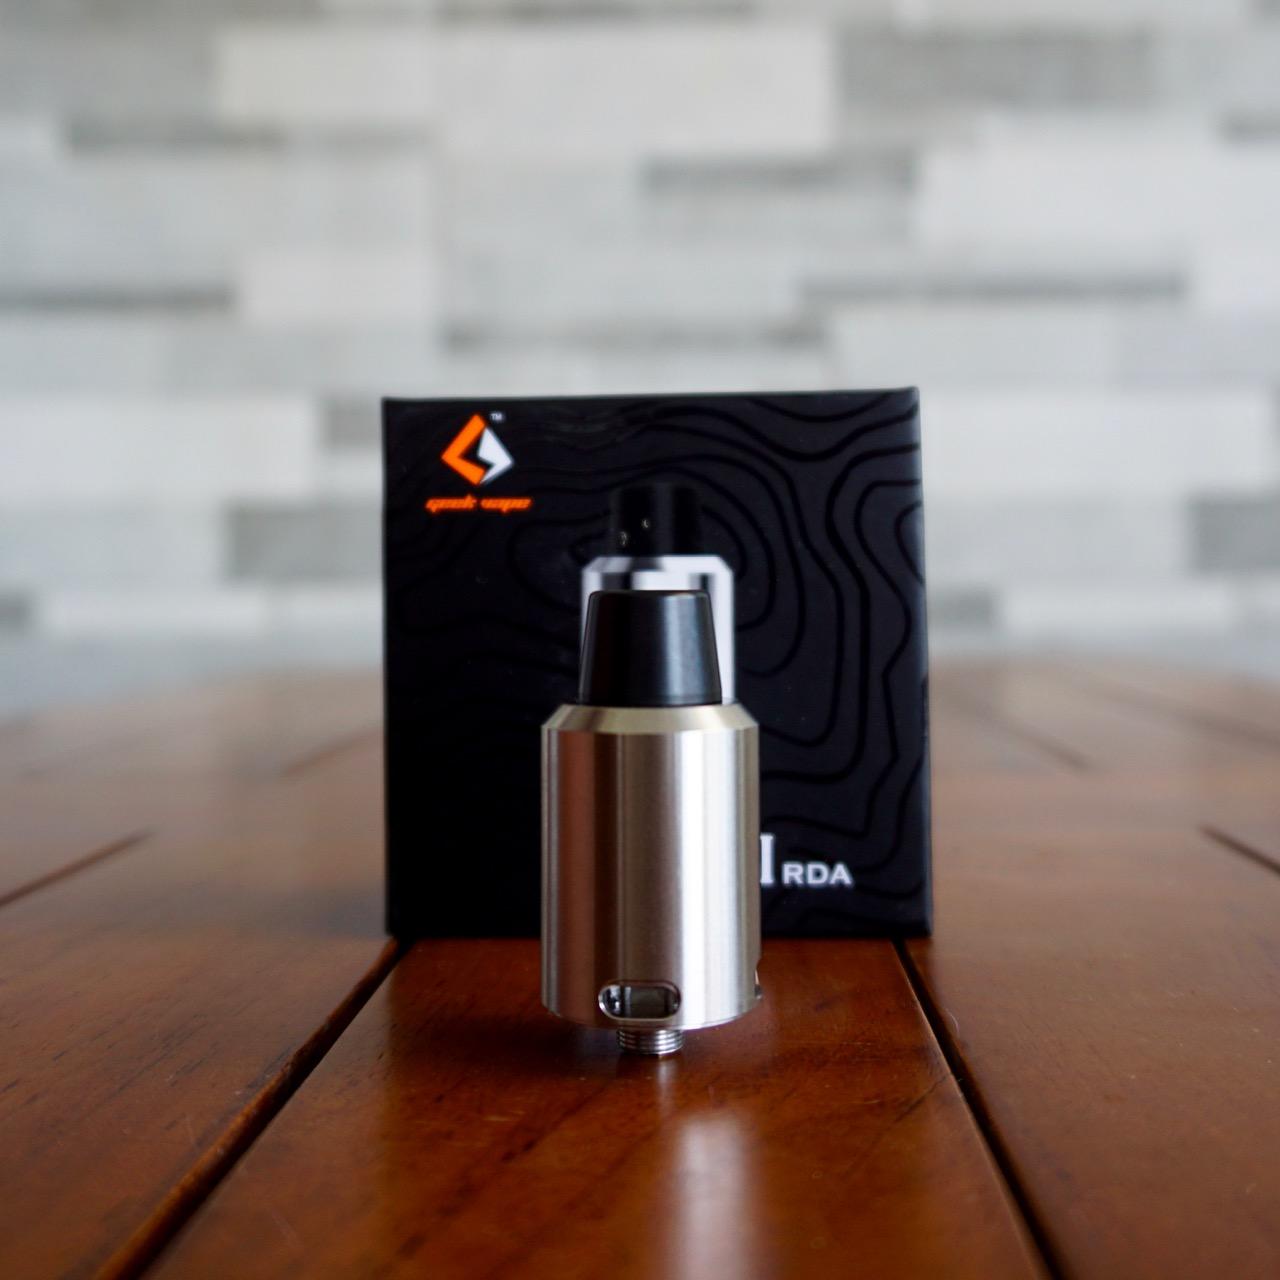 Authentic Geek Vape Tsunami Rda Habis Vanilla Cube Store Geekvape Peerless 24mm Atomizer April 24 2016